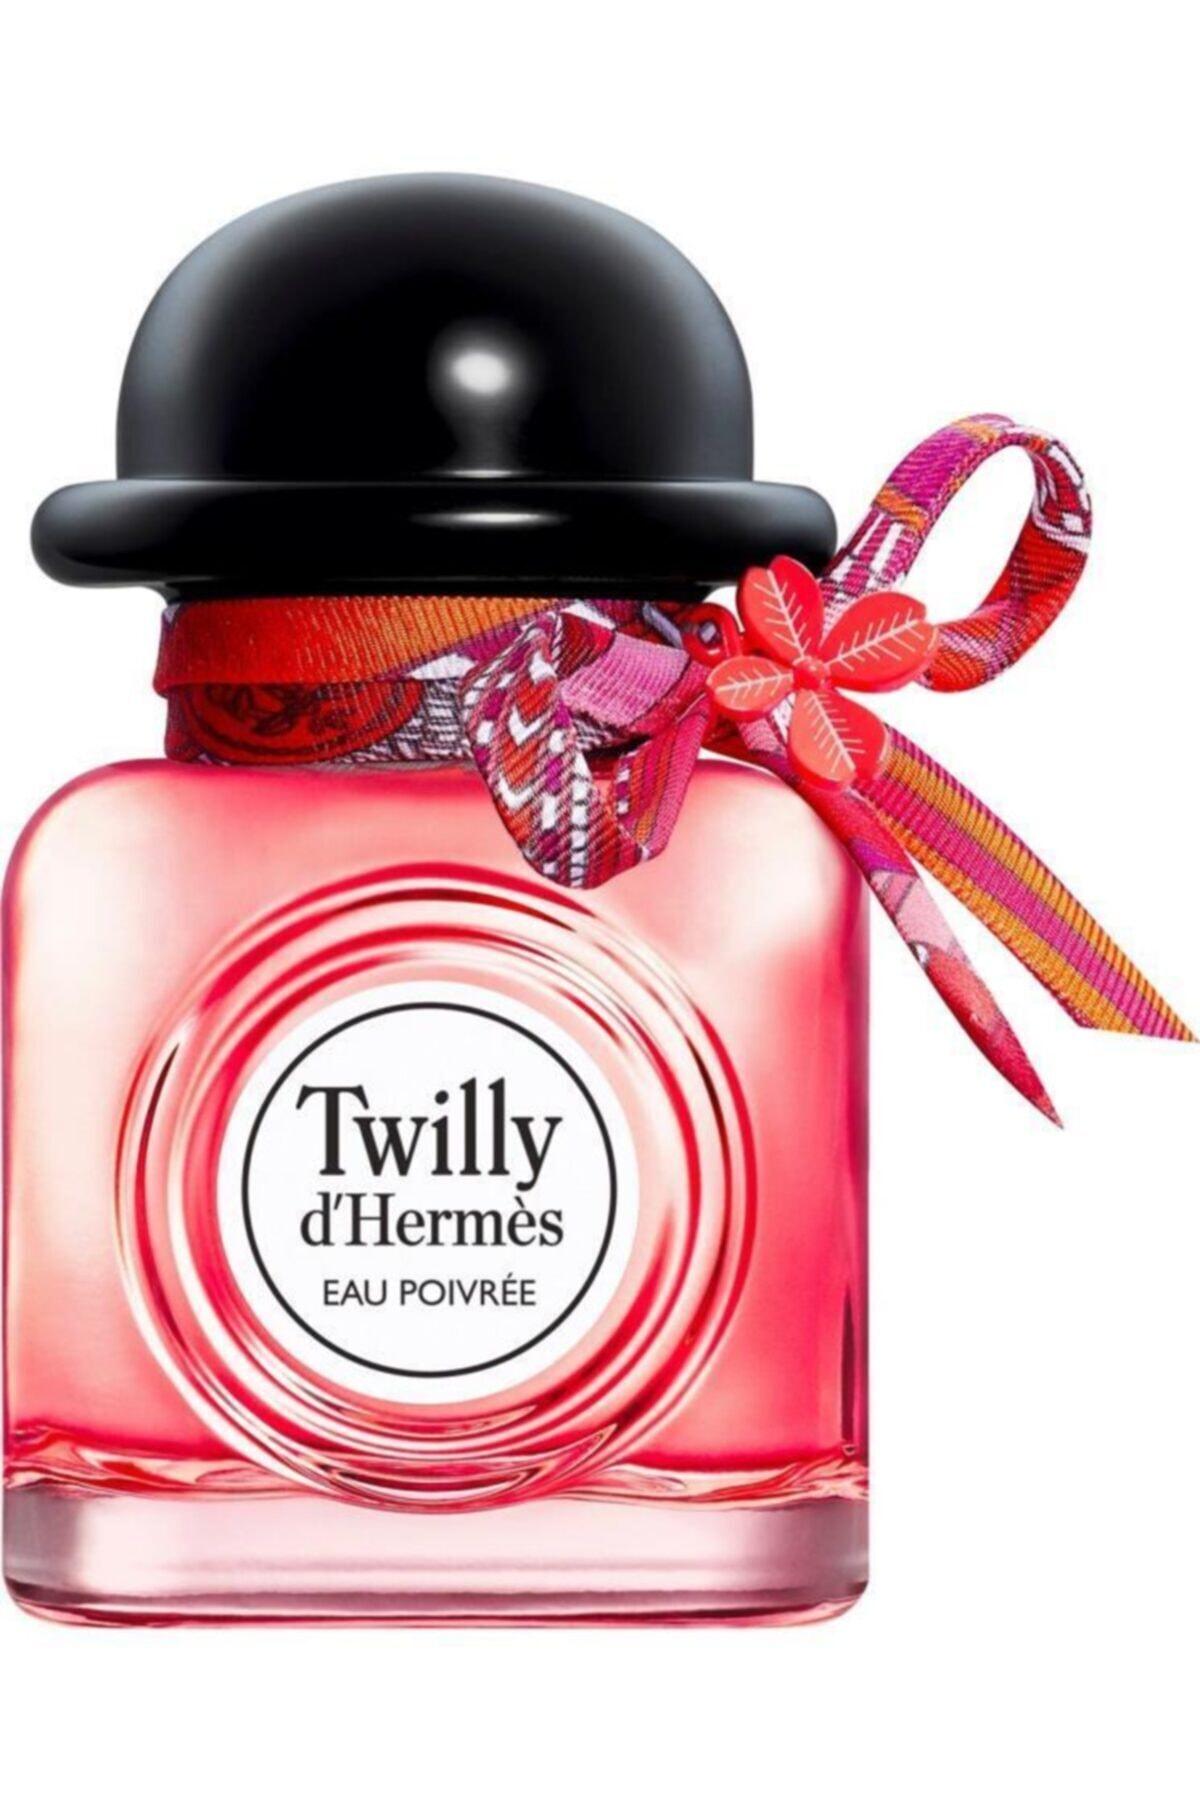 Hermes Twilly D'Hermes Eau Poivree Edp 85 ml Kadın Parfüm 3346133202971 1